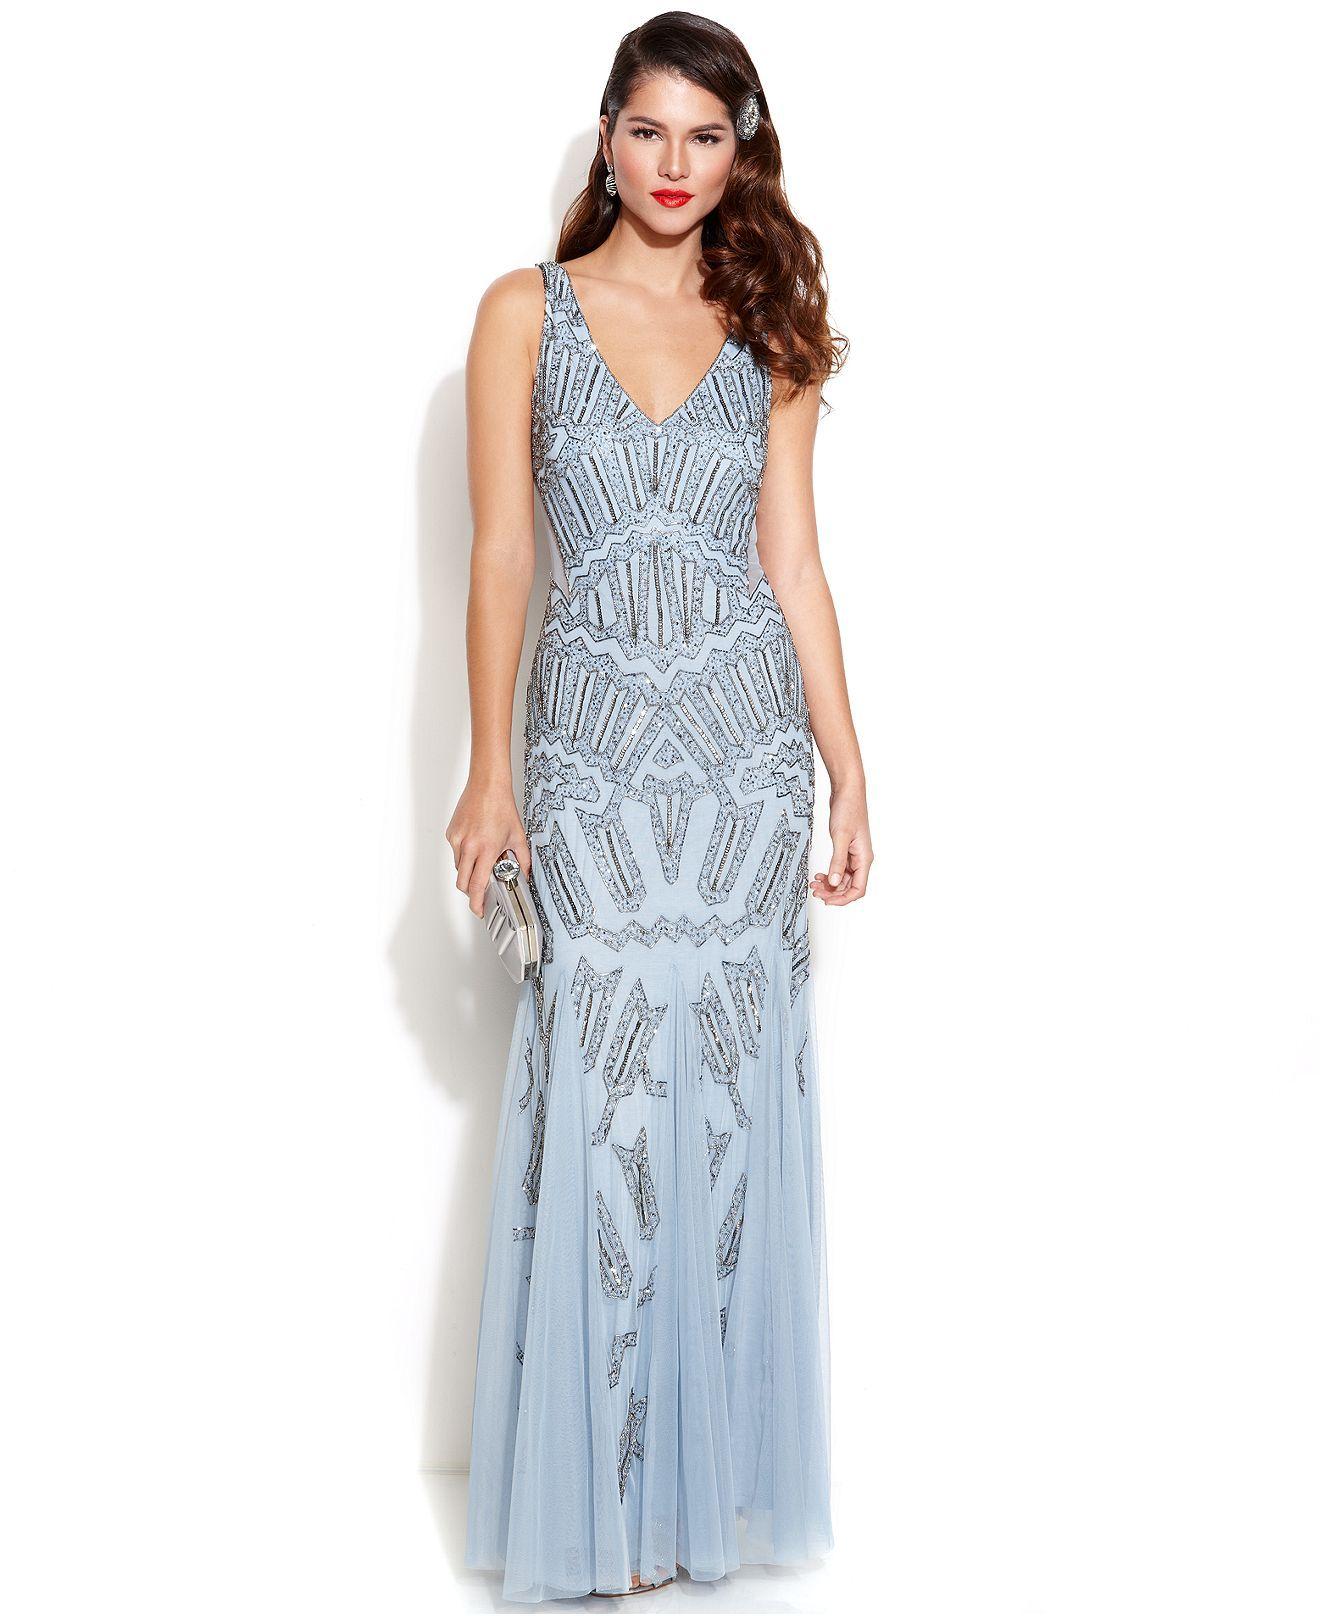 Glam the dress session // Adrianna Papell Sleeveless Beaded Mermaid ...